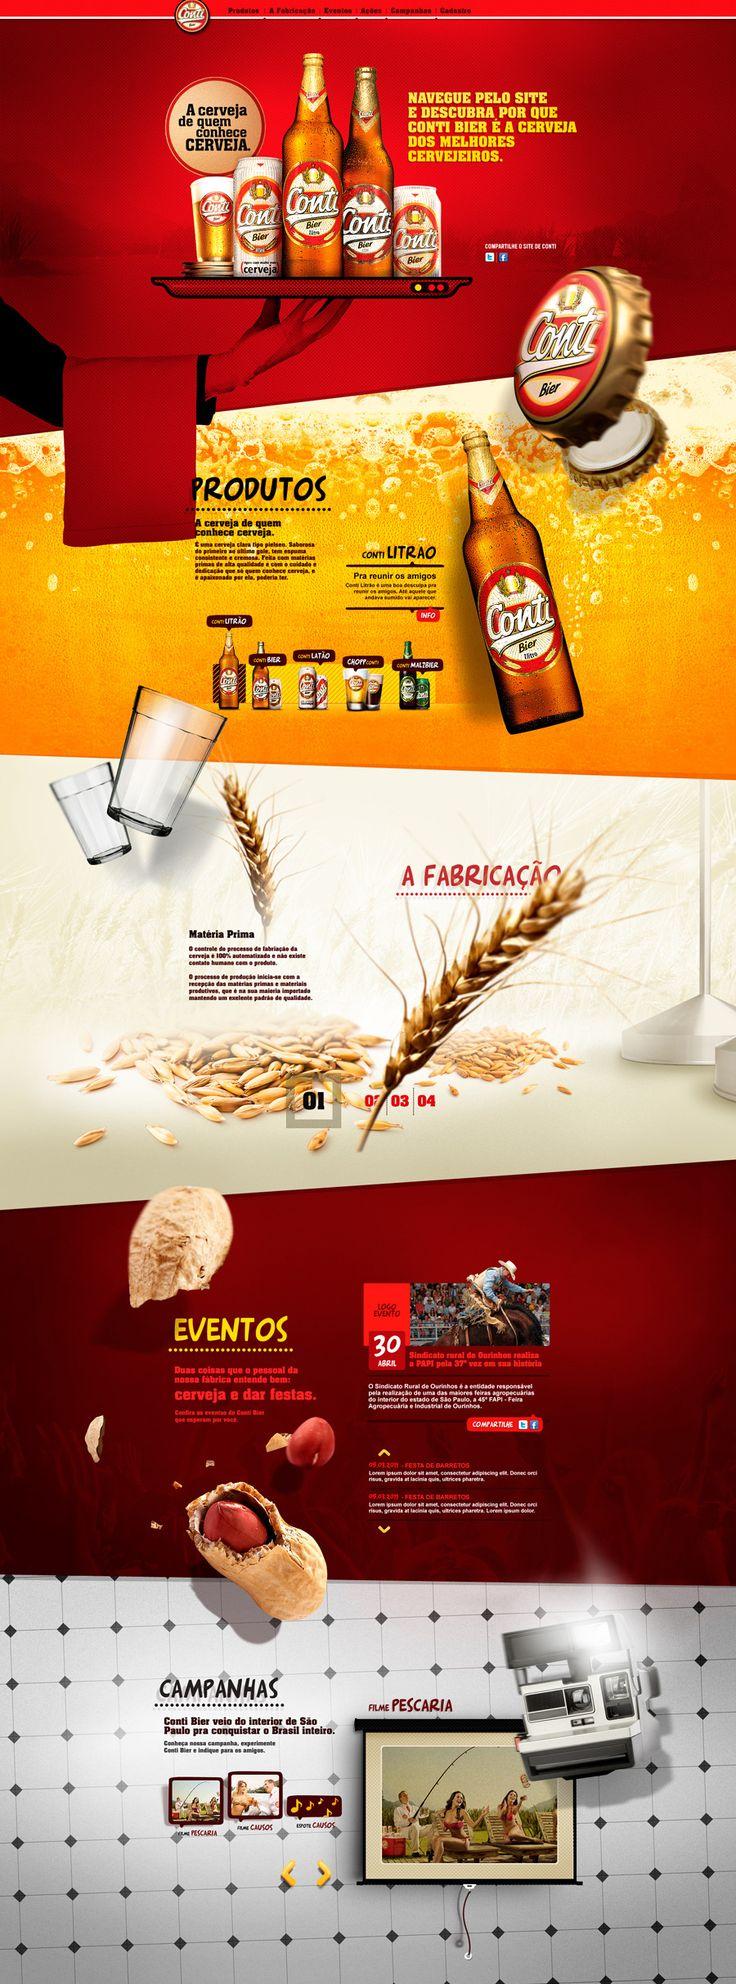 Website  by Haris.Karat,  Webdesigner,  haris.karat@gmail.com,  Call:+91 8086562746